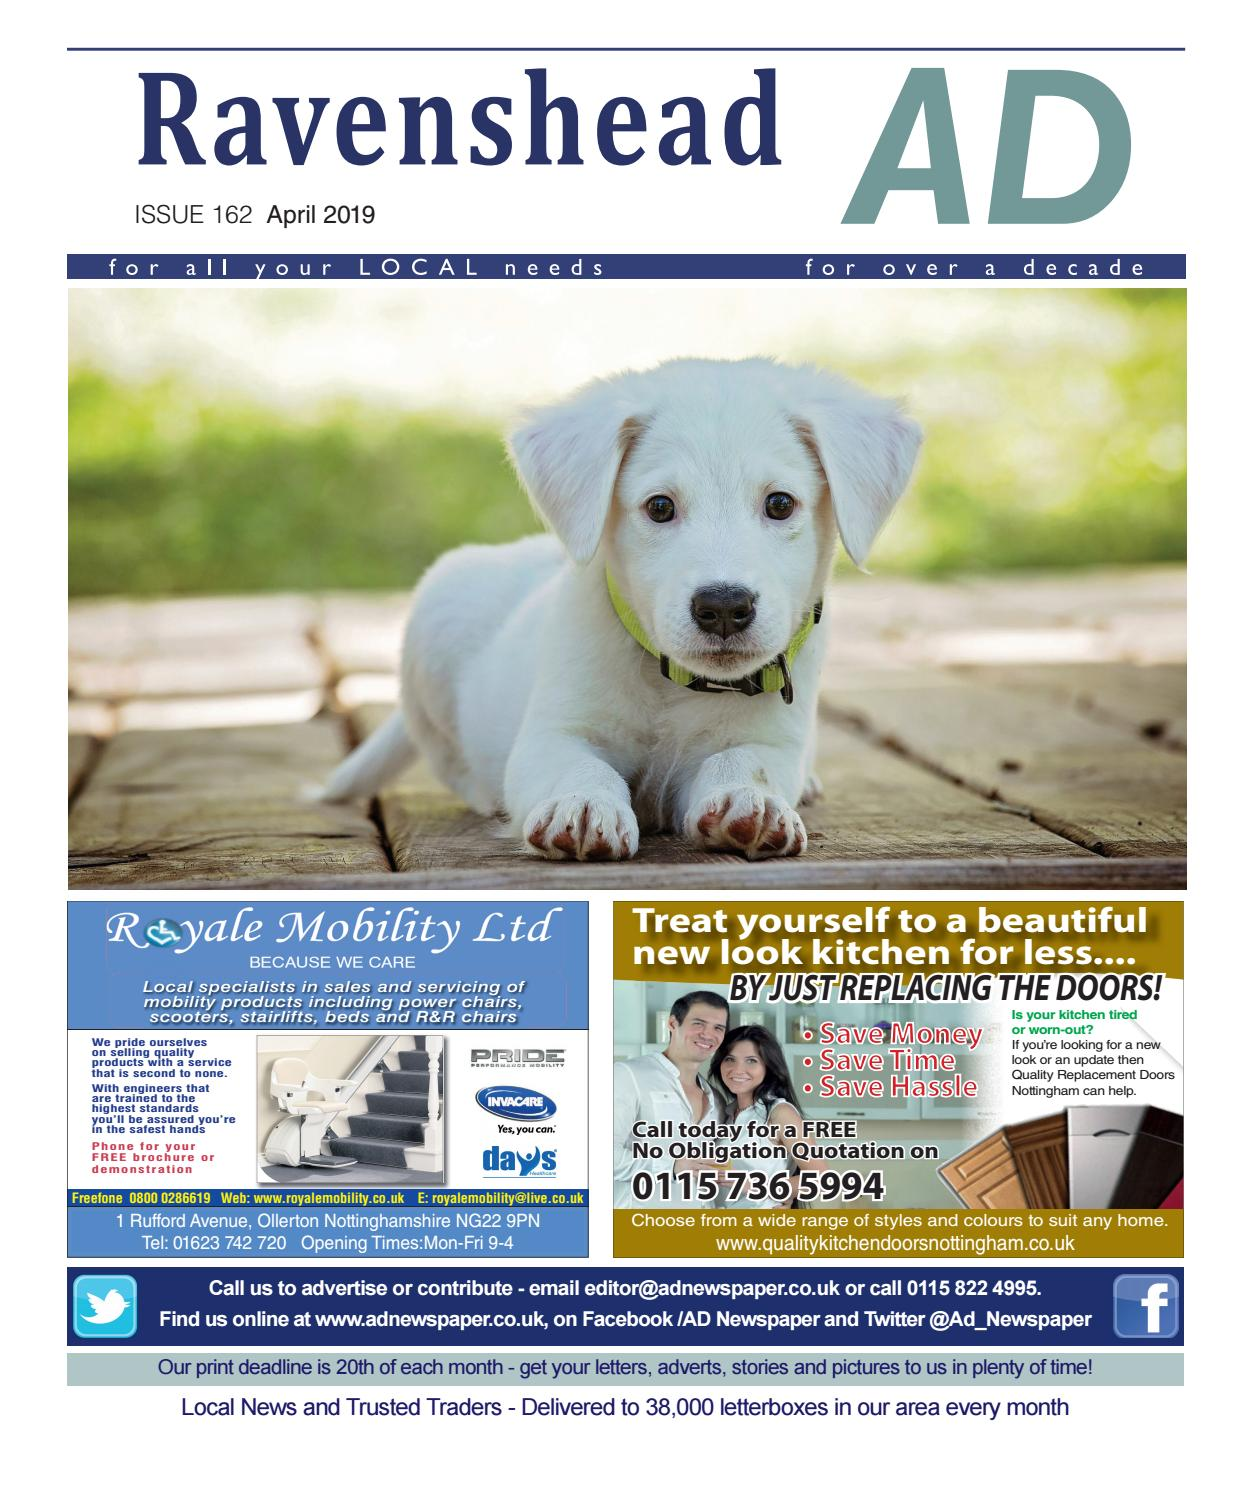 Ad Newspaper for Ravenshead, Mansfield, Nottingham April